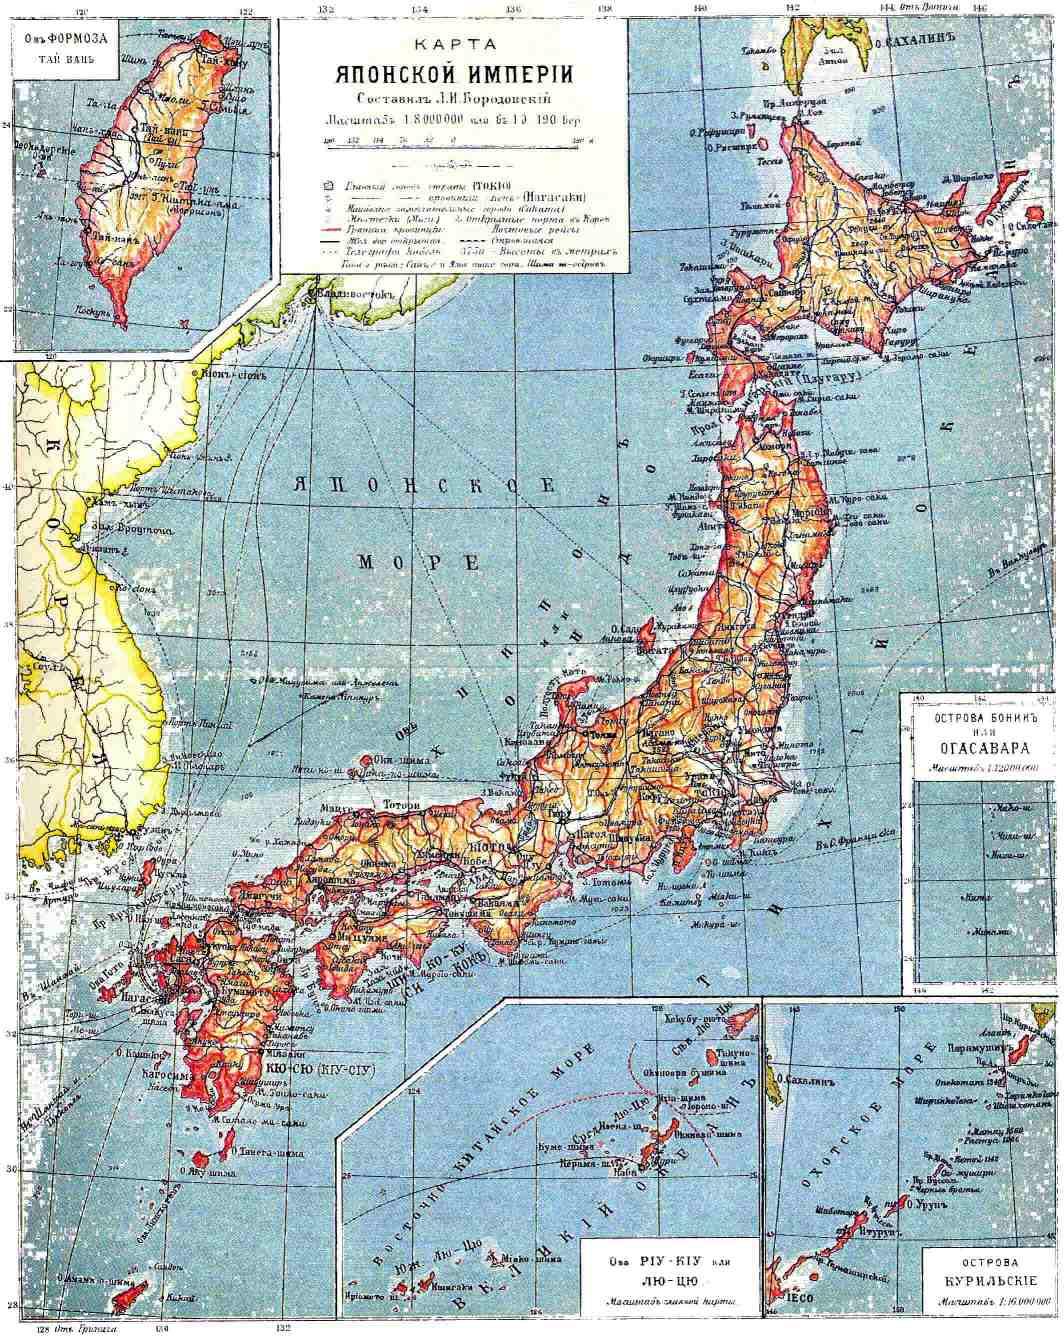 FileJapan Map Brochhausjpg Wikimedia Commons - Map 0f japan